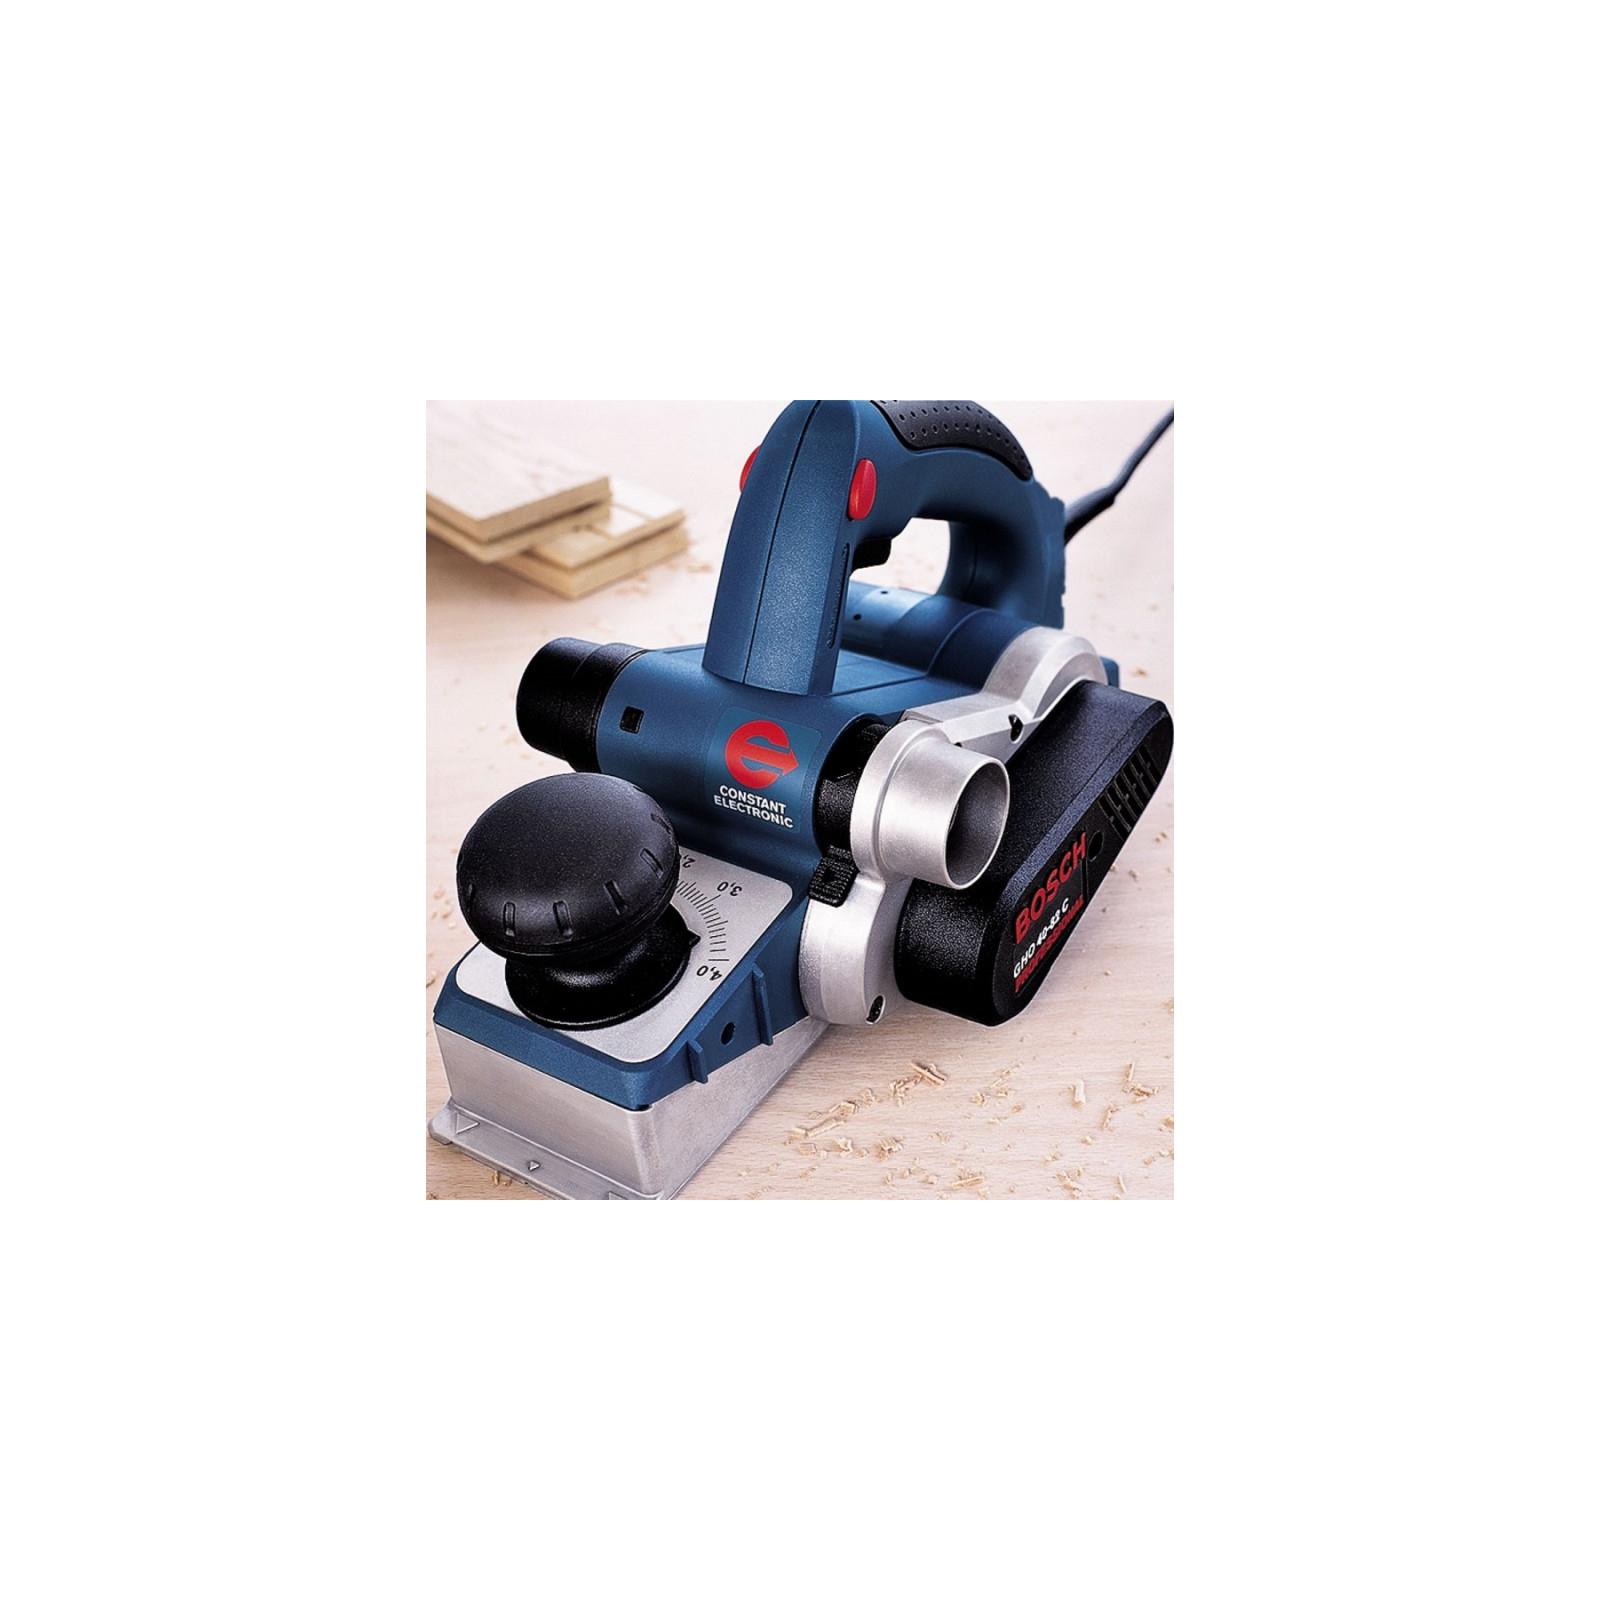 Электрорубанок Bosch GHO 40-82 C Professional (0.601.59A.760) изображение 8